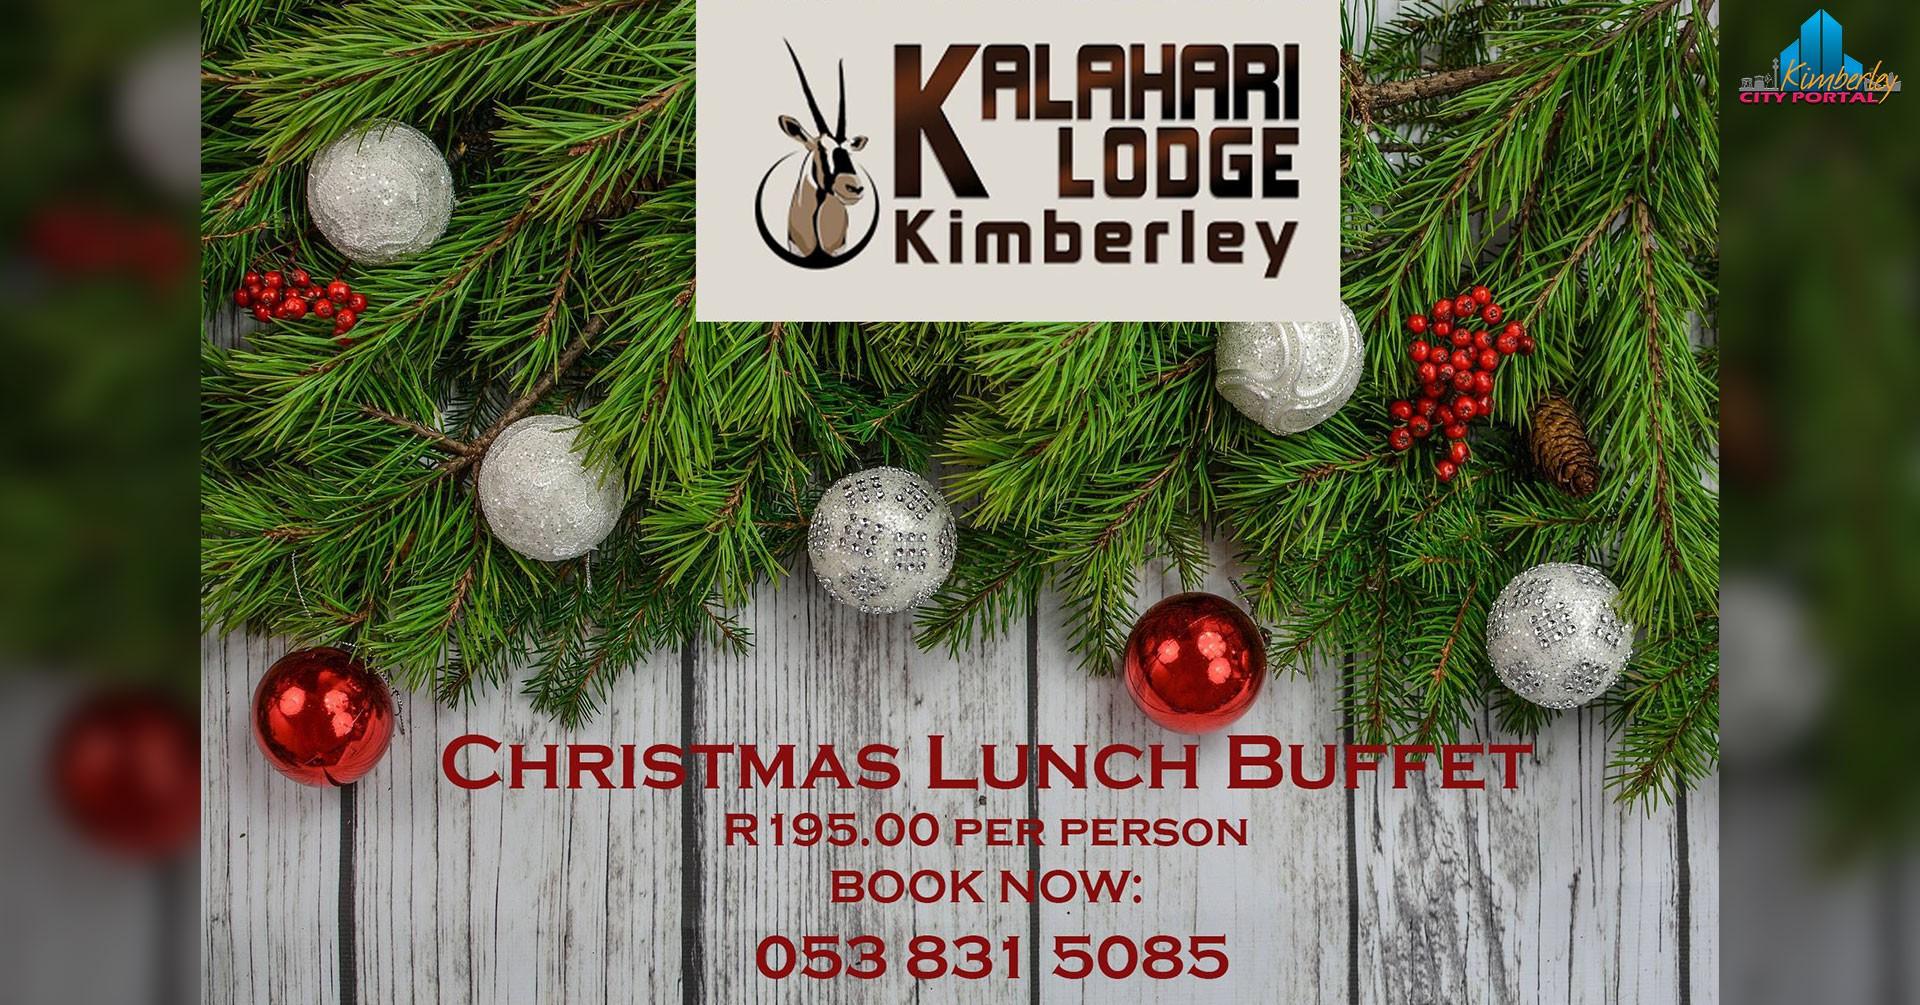 Eating Christmas In The Kalahari.Christmas Lunch Buffet Kalahari Lodge Kimberley Portal